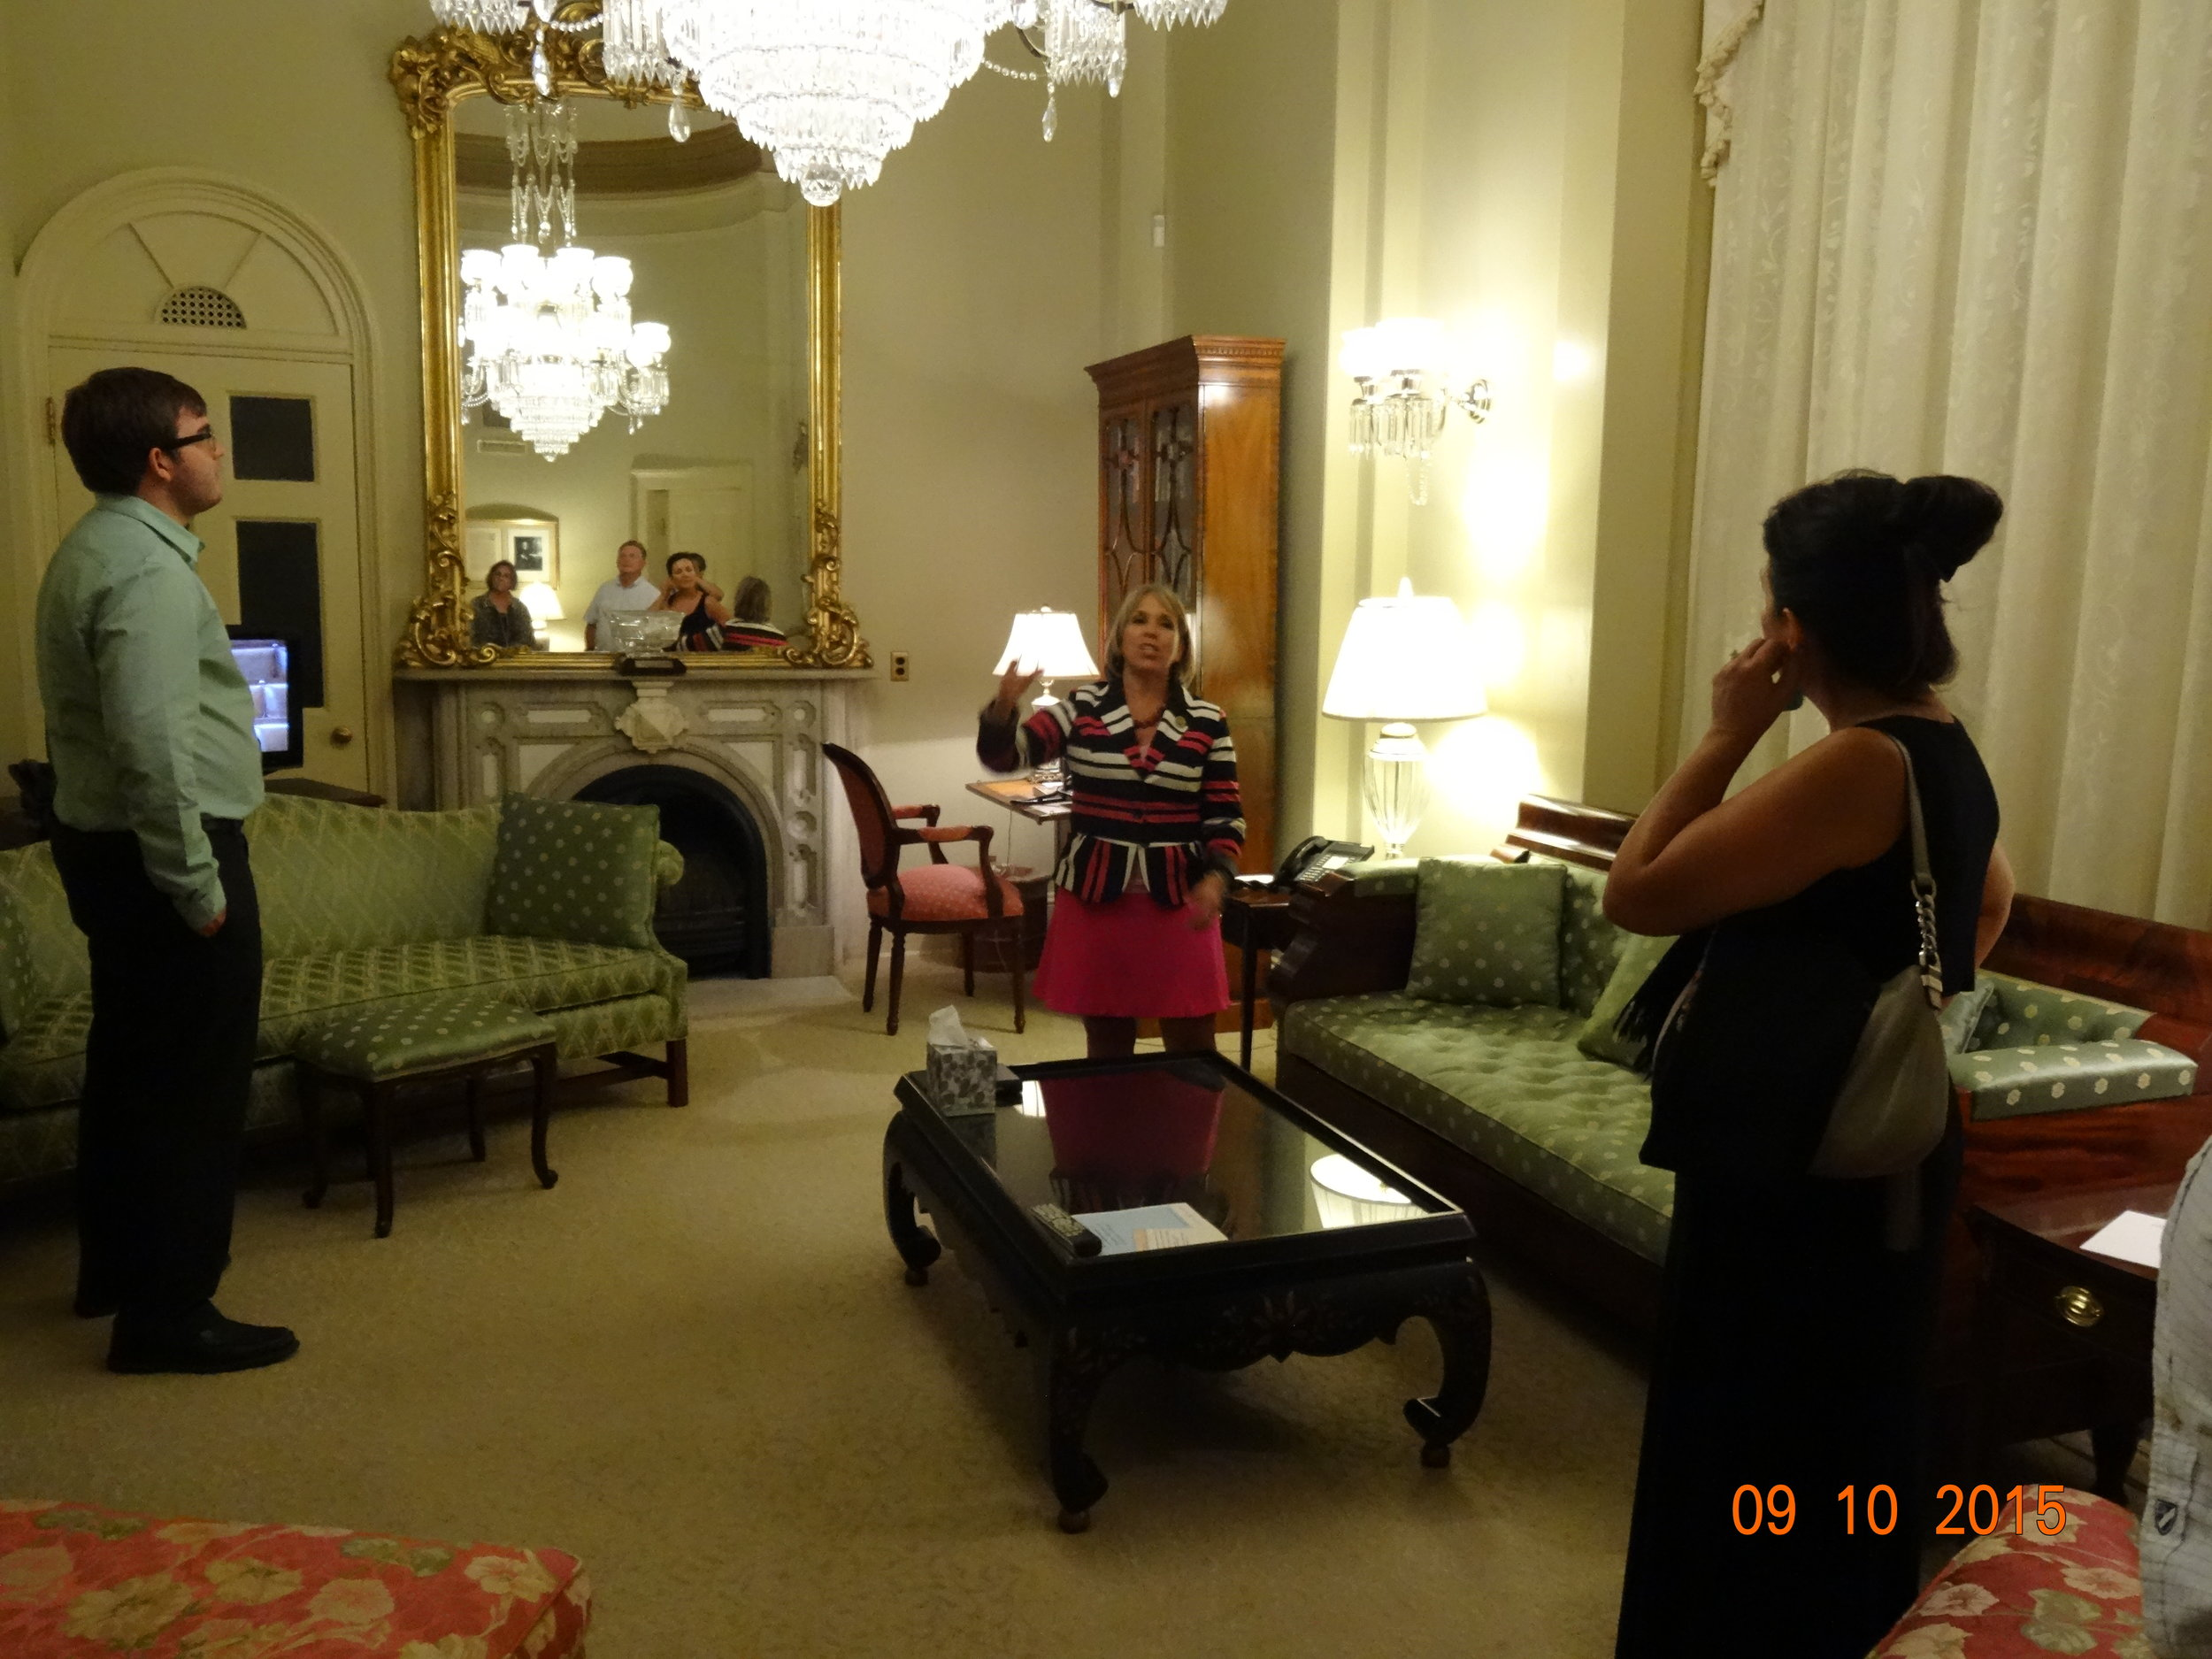 The room where John Quincy Adams passed away